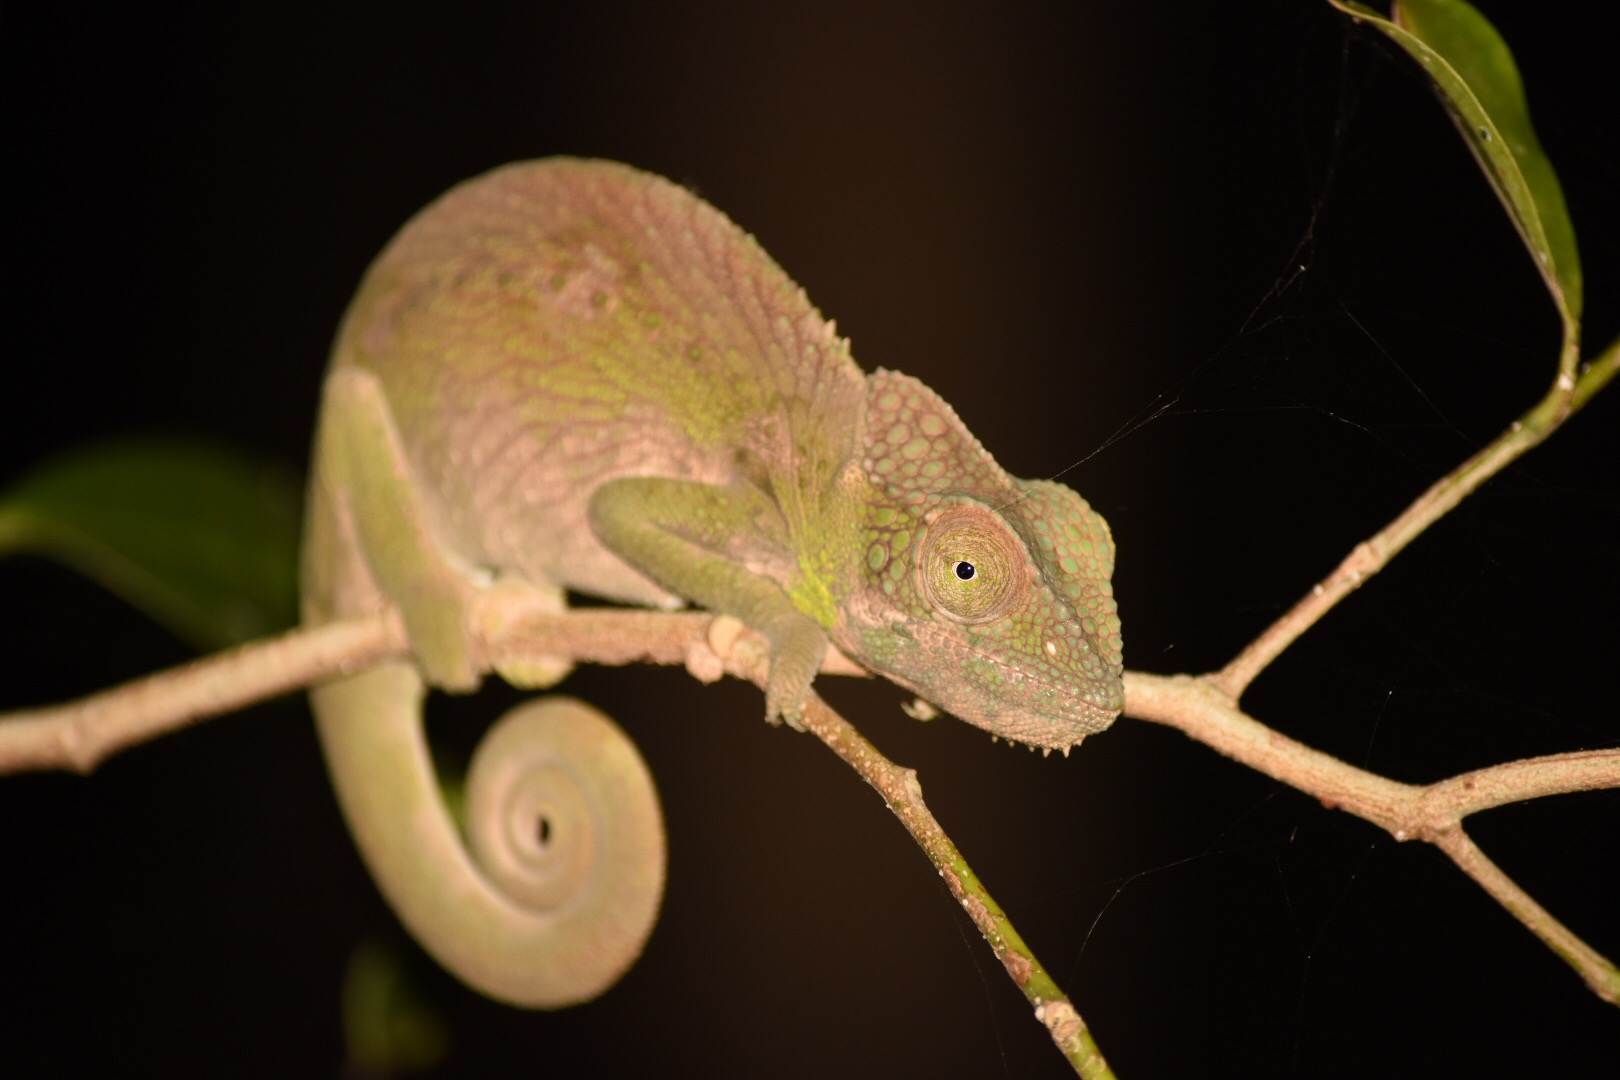 Chameleon by night!